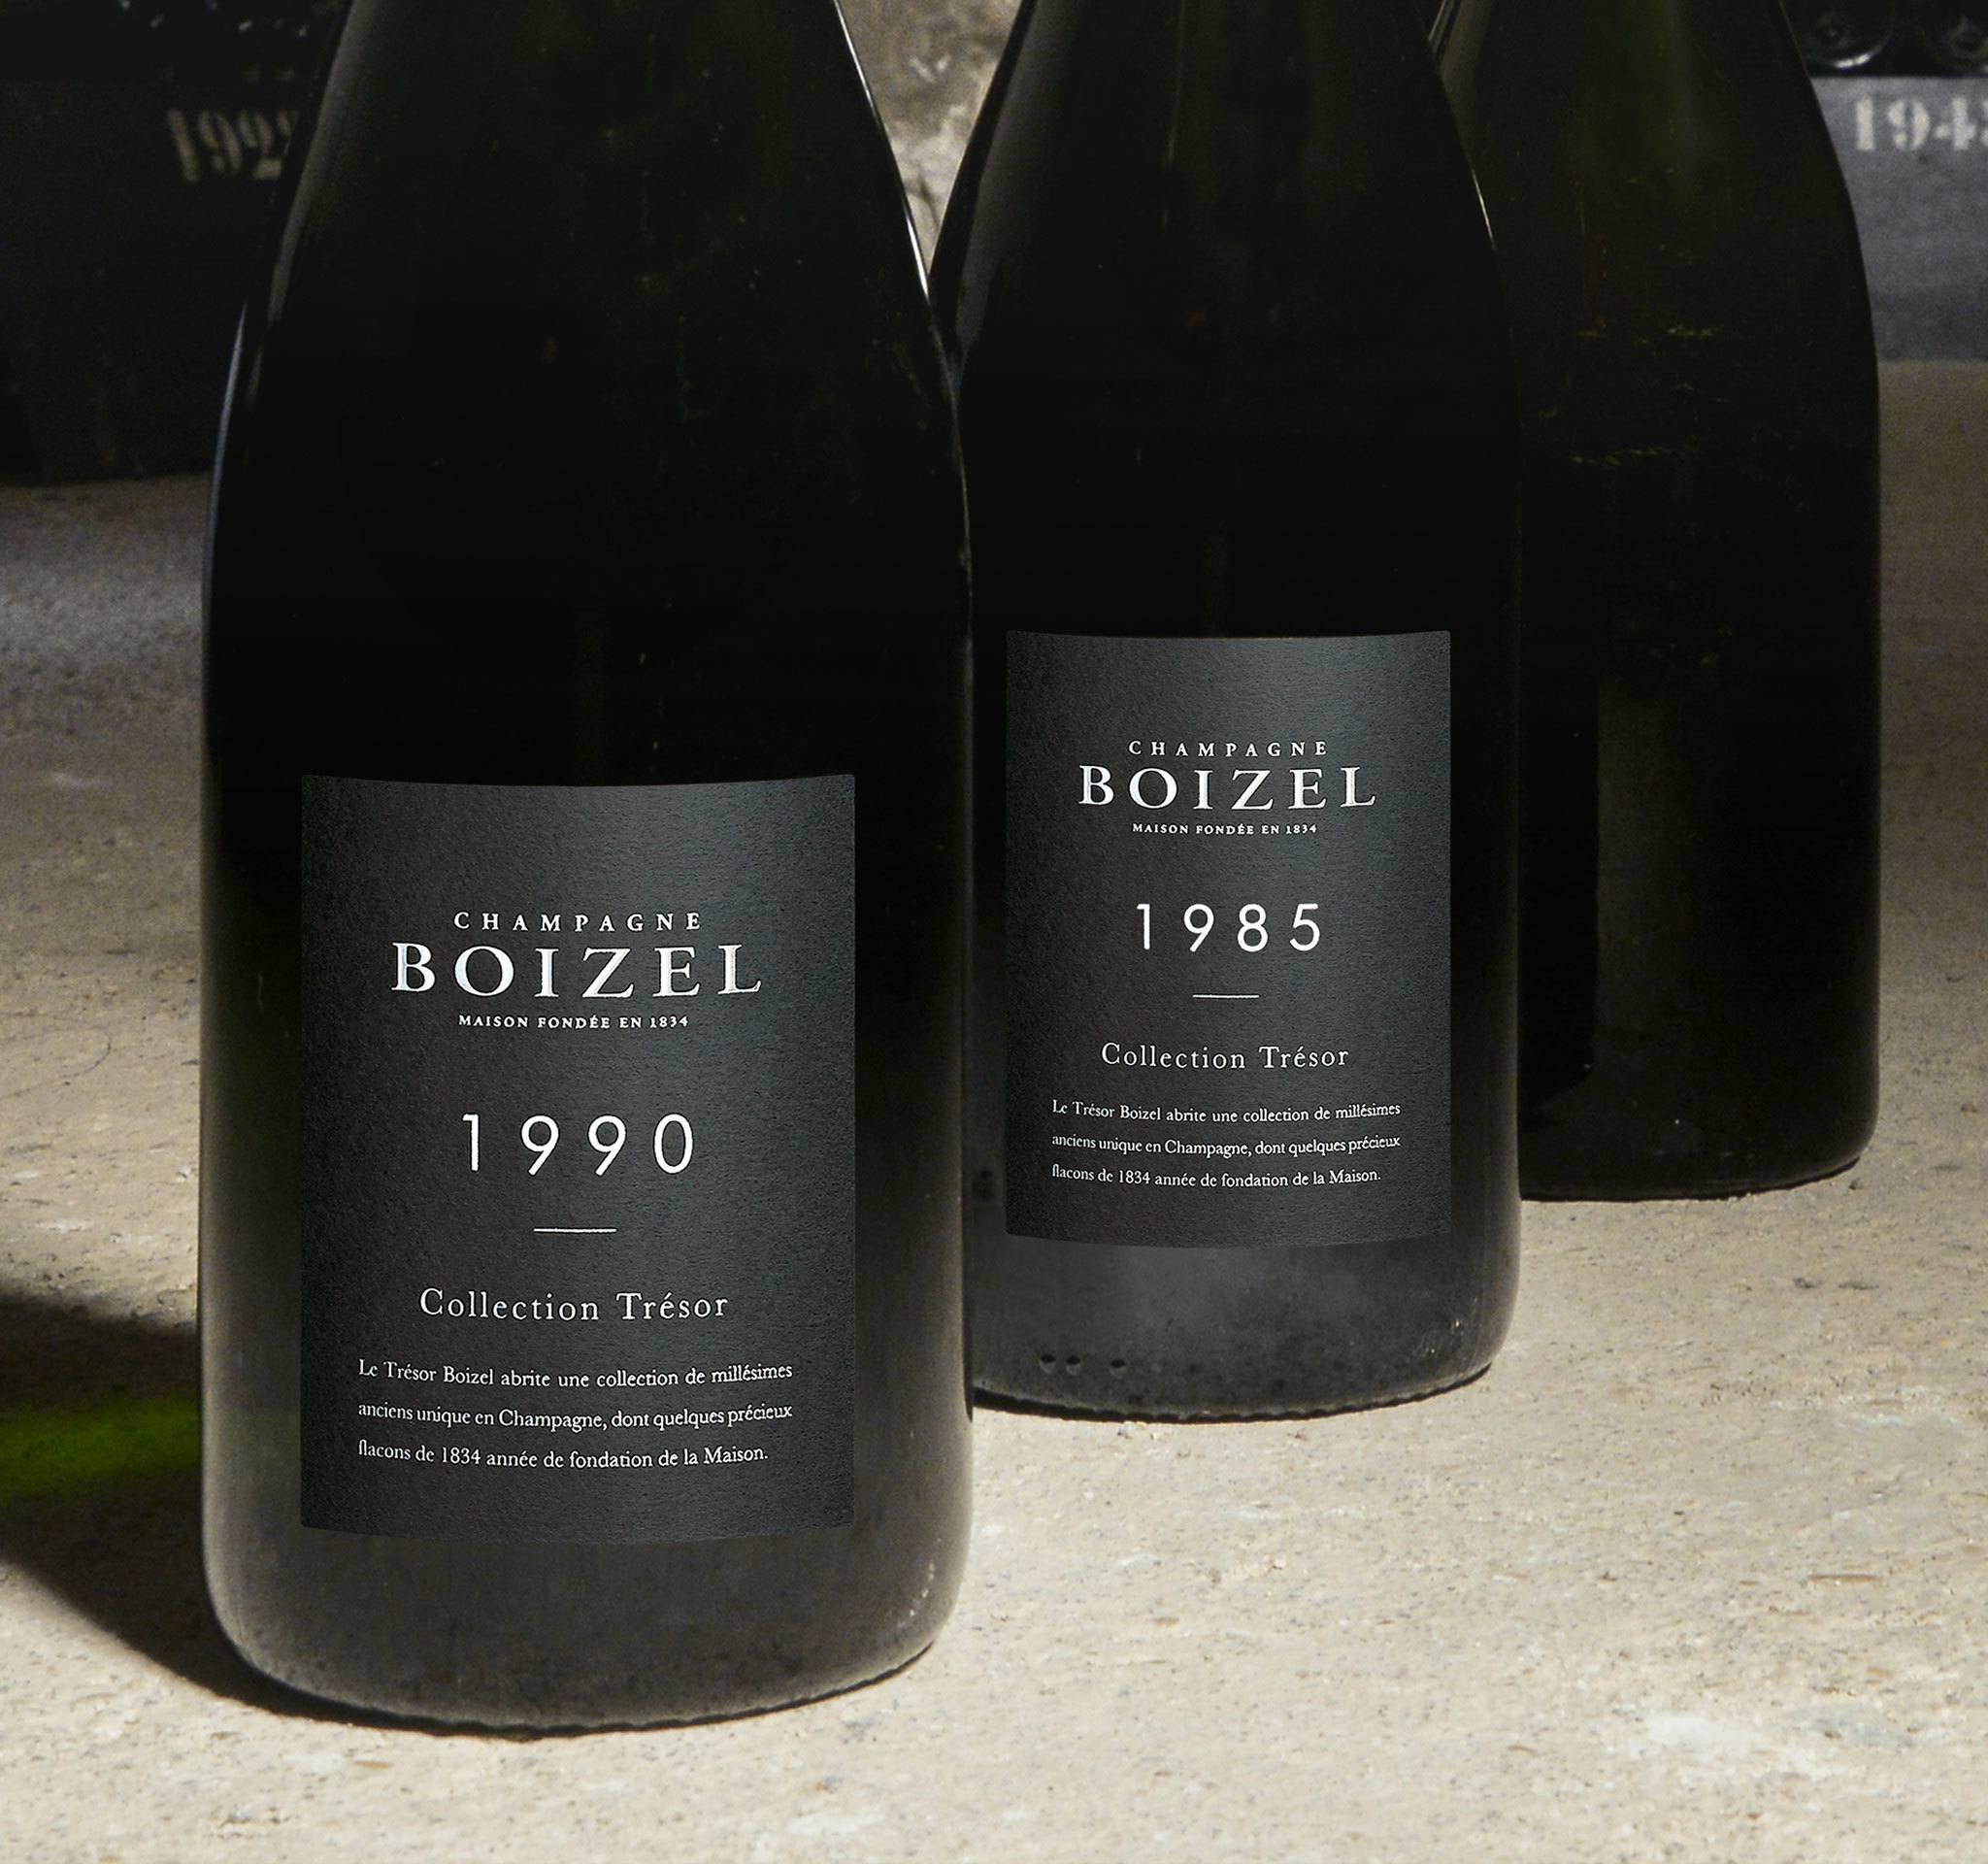 La collection Trésor - Champagne Boizel - Epernay France